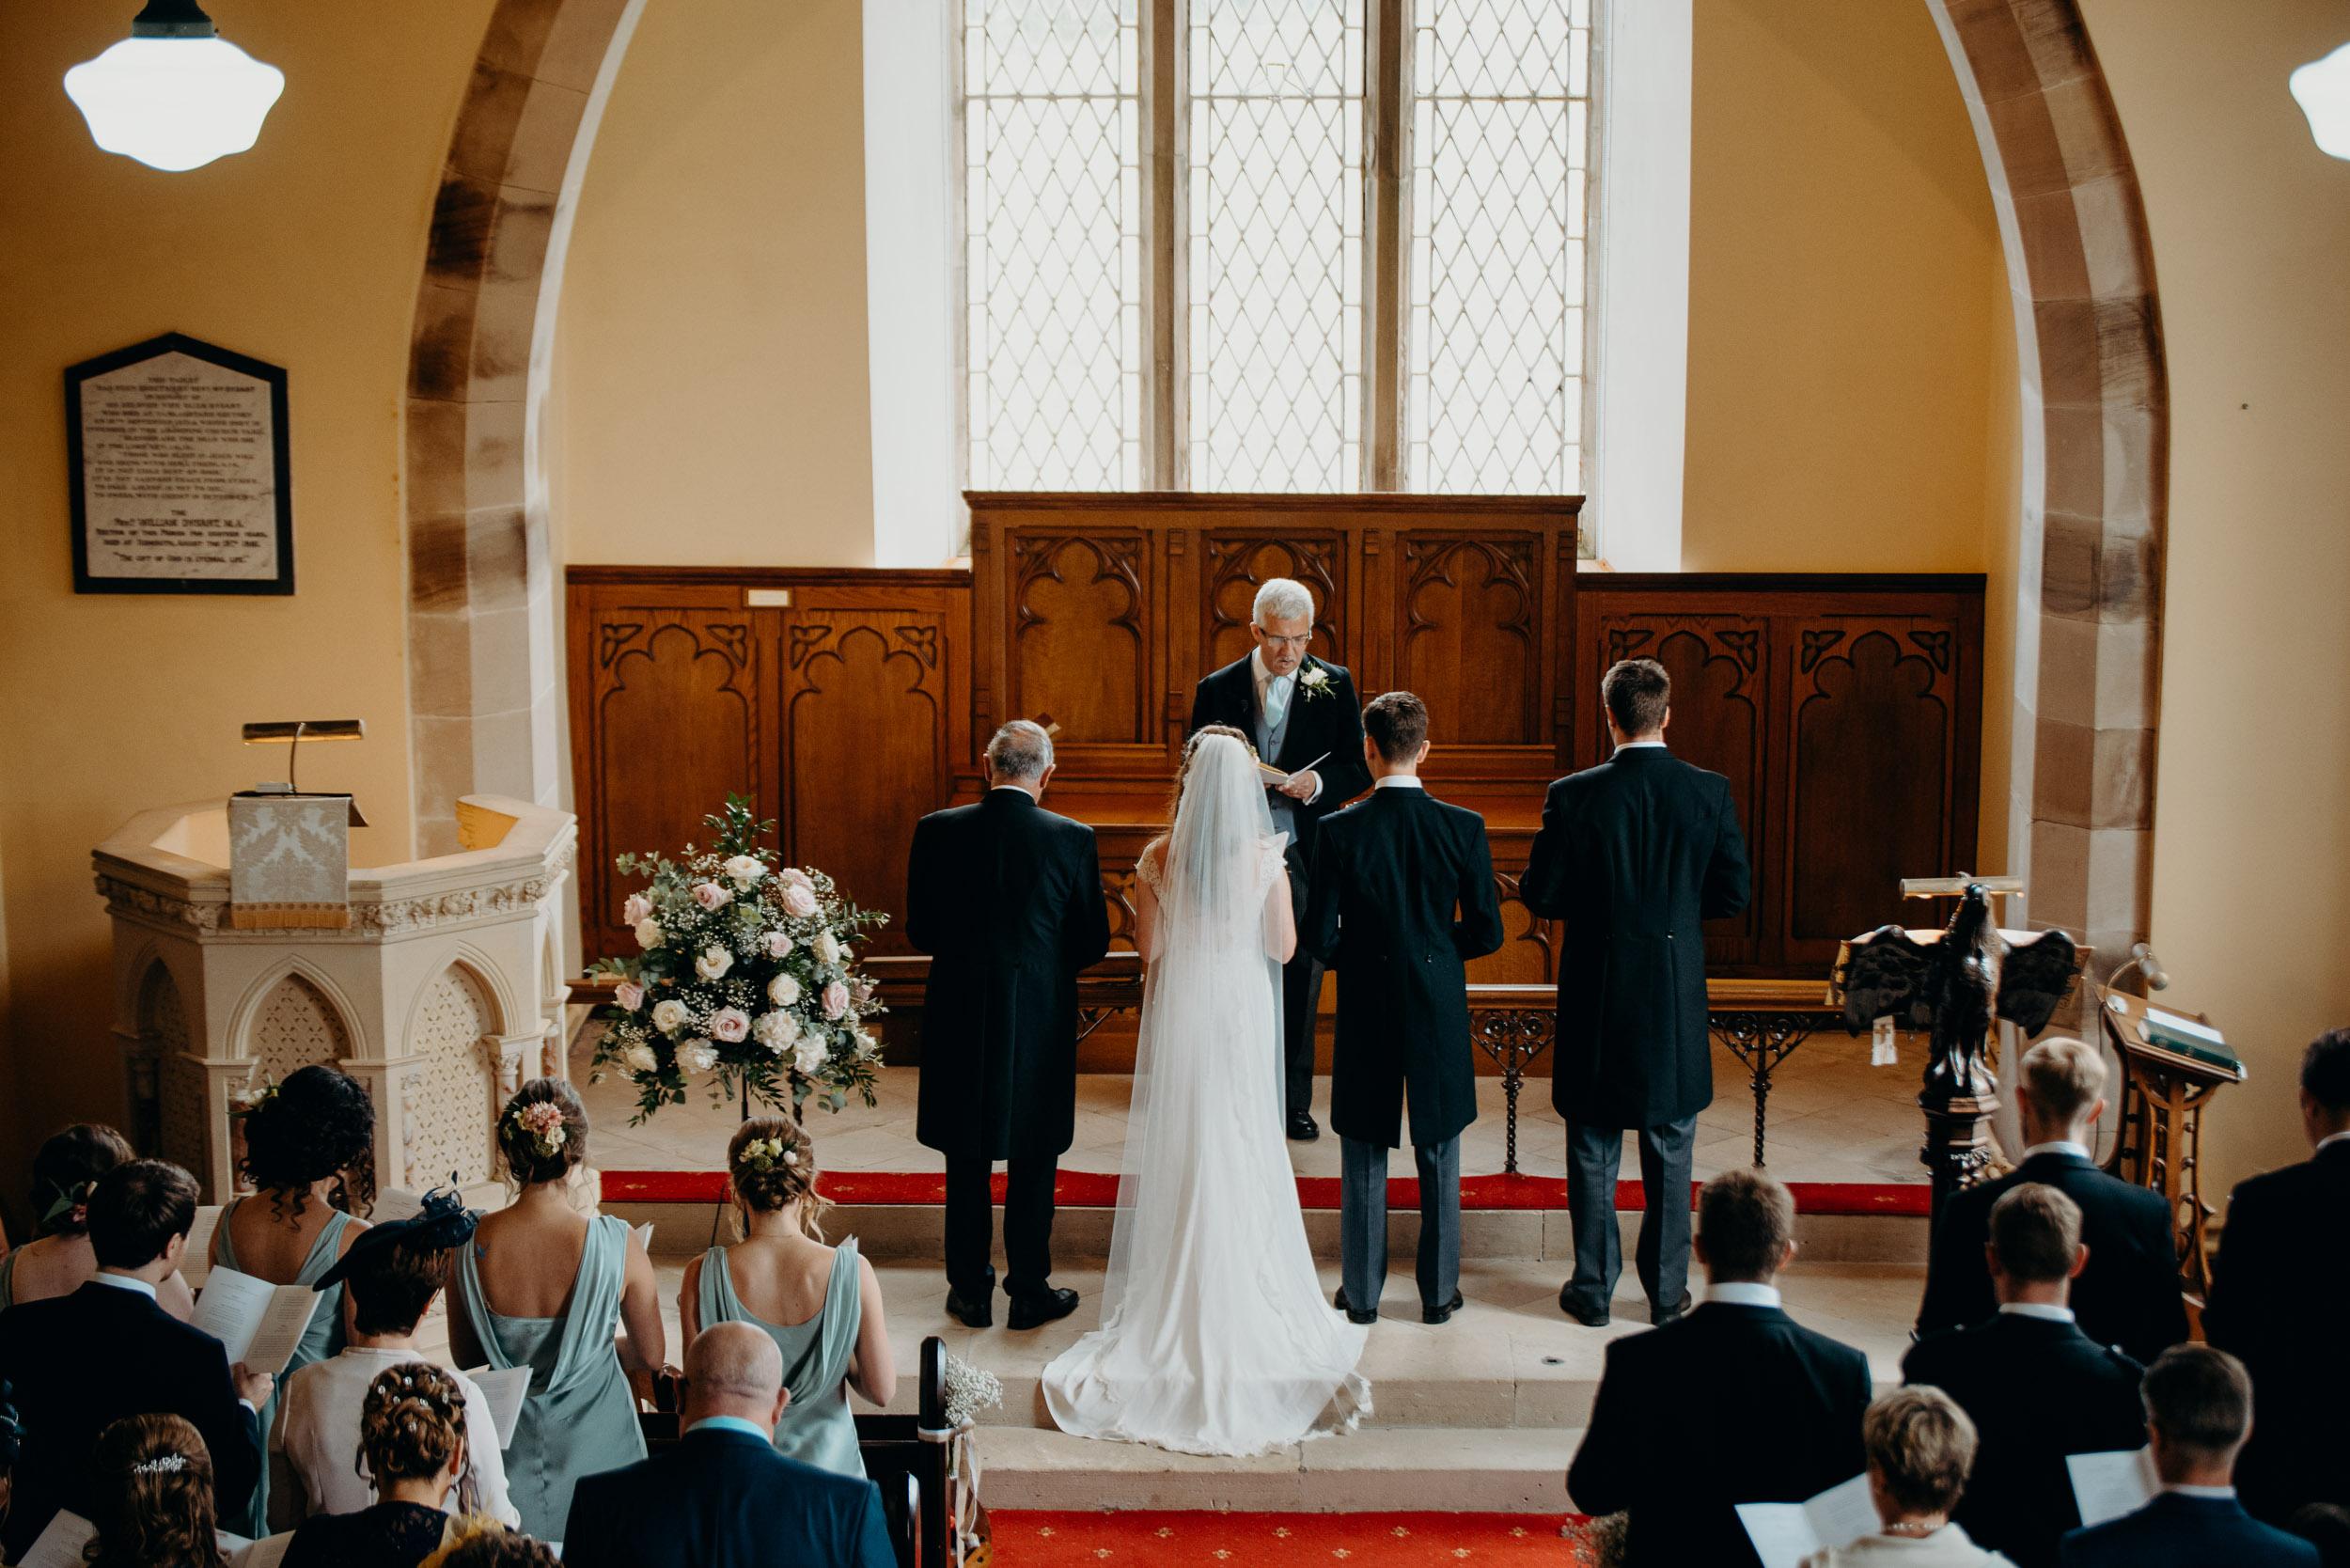 drenagh estate wedding photography-46.jpg